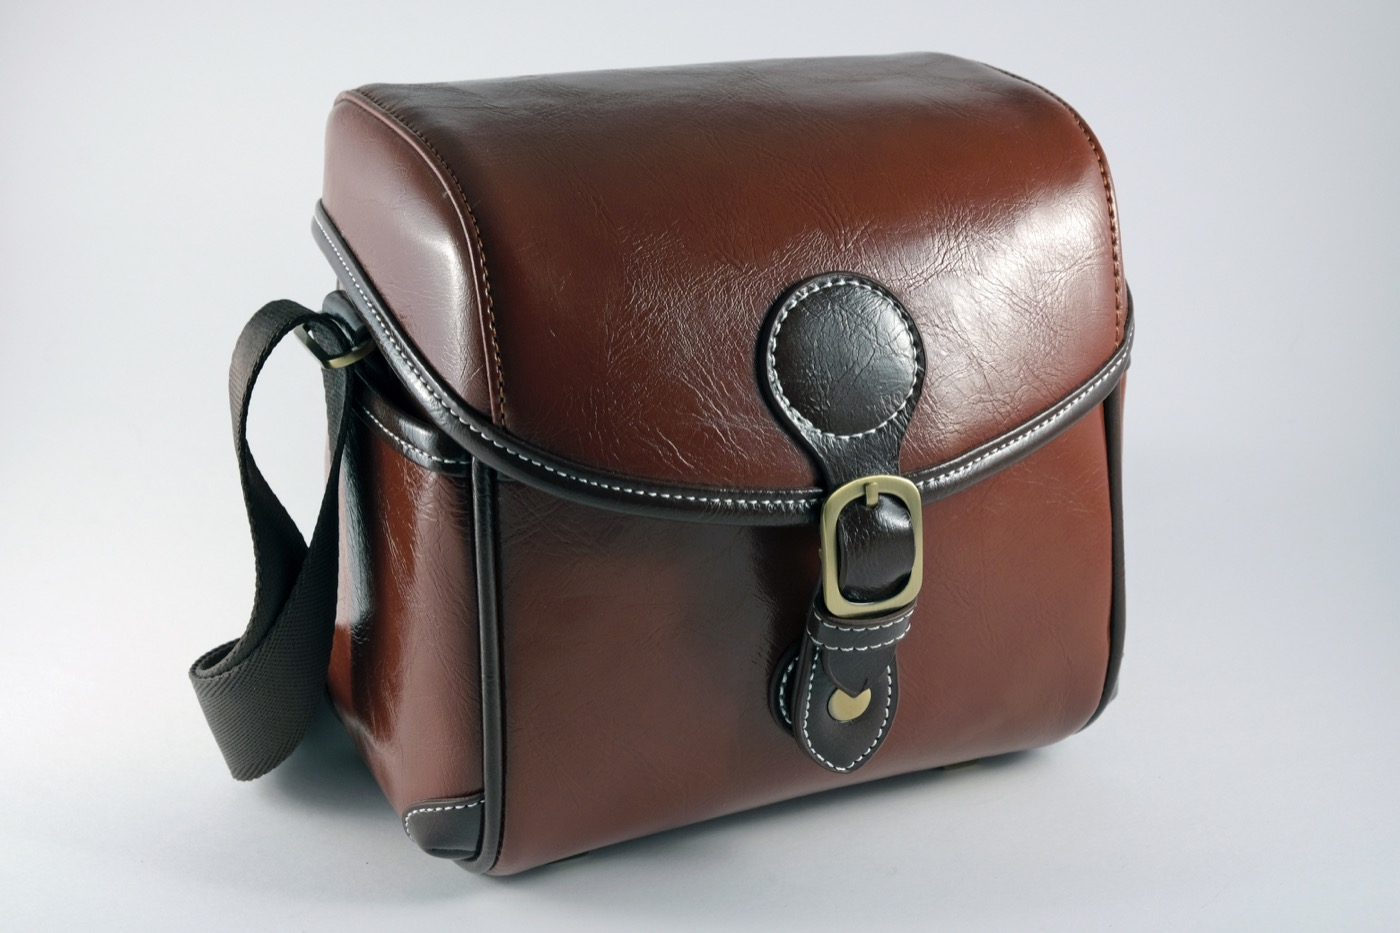 Brown leather camera bag